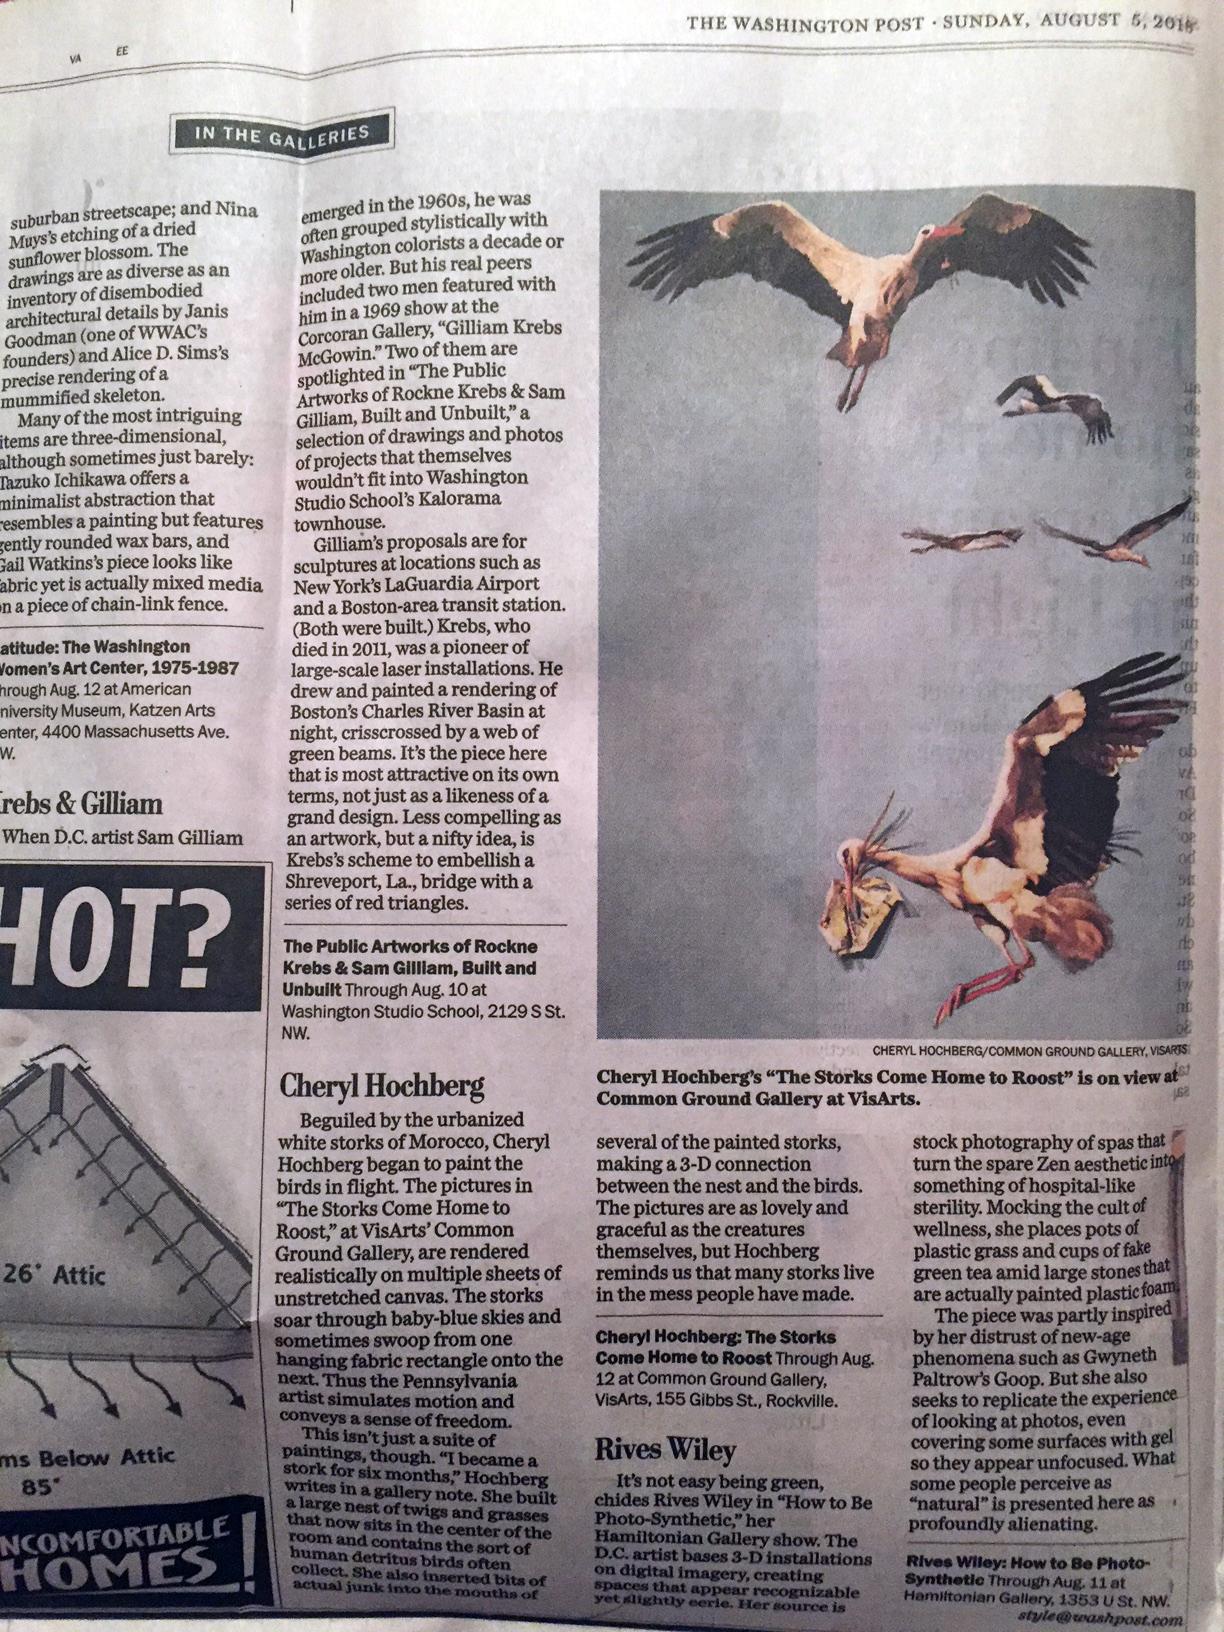 Washington Post review